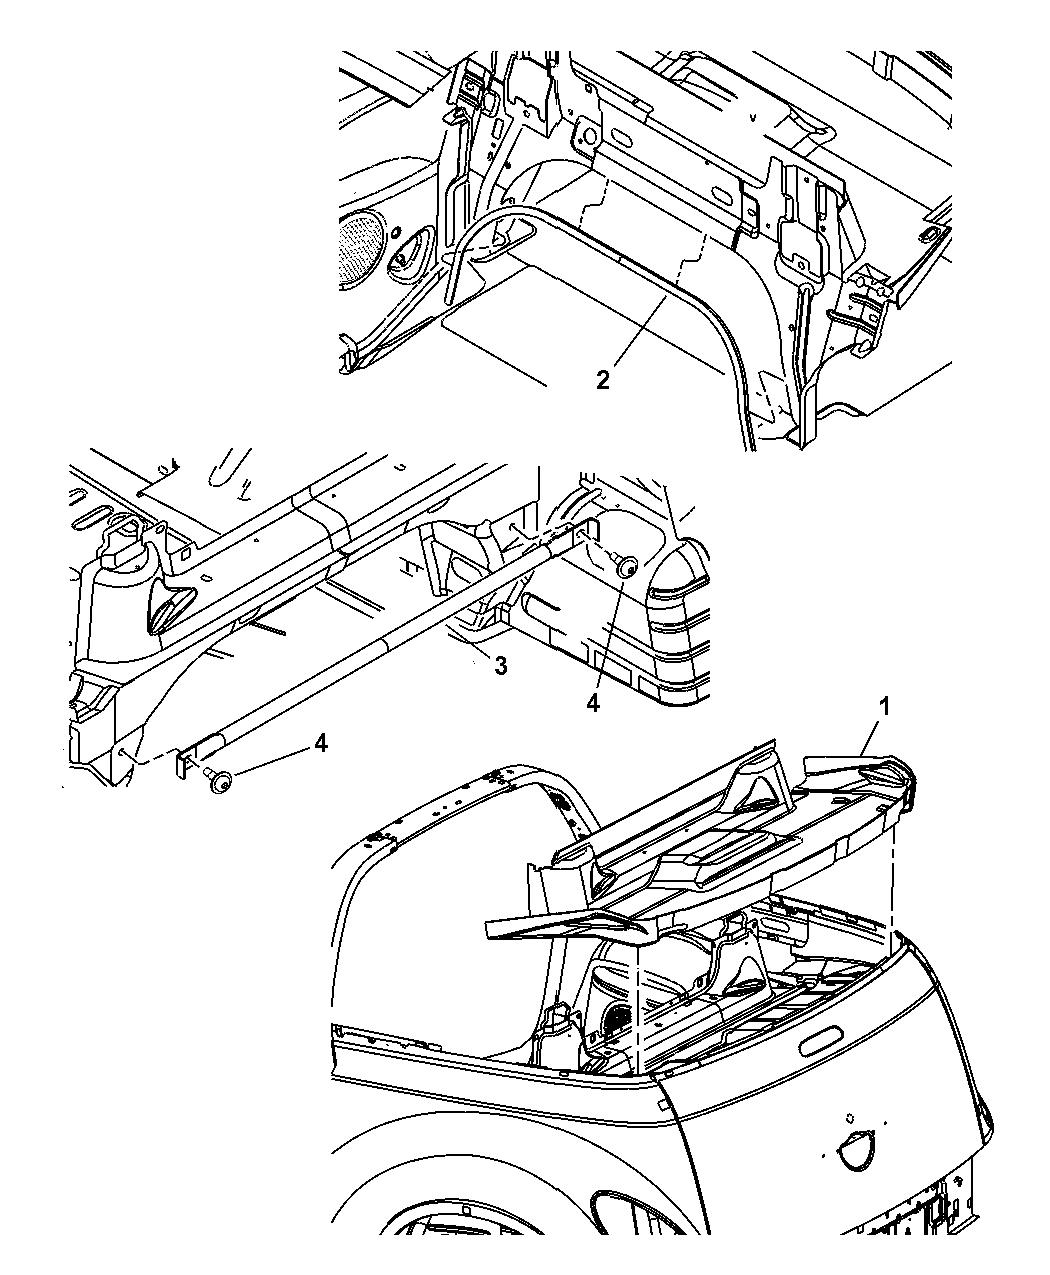 2005 Convertible Pt Cruiser Engine Diagram Wiring Diagram Versed Overview Versed Overview Lasuiteclub It